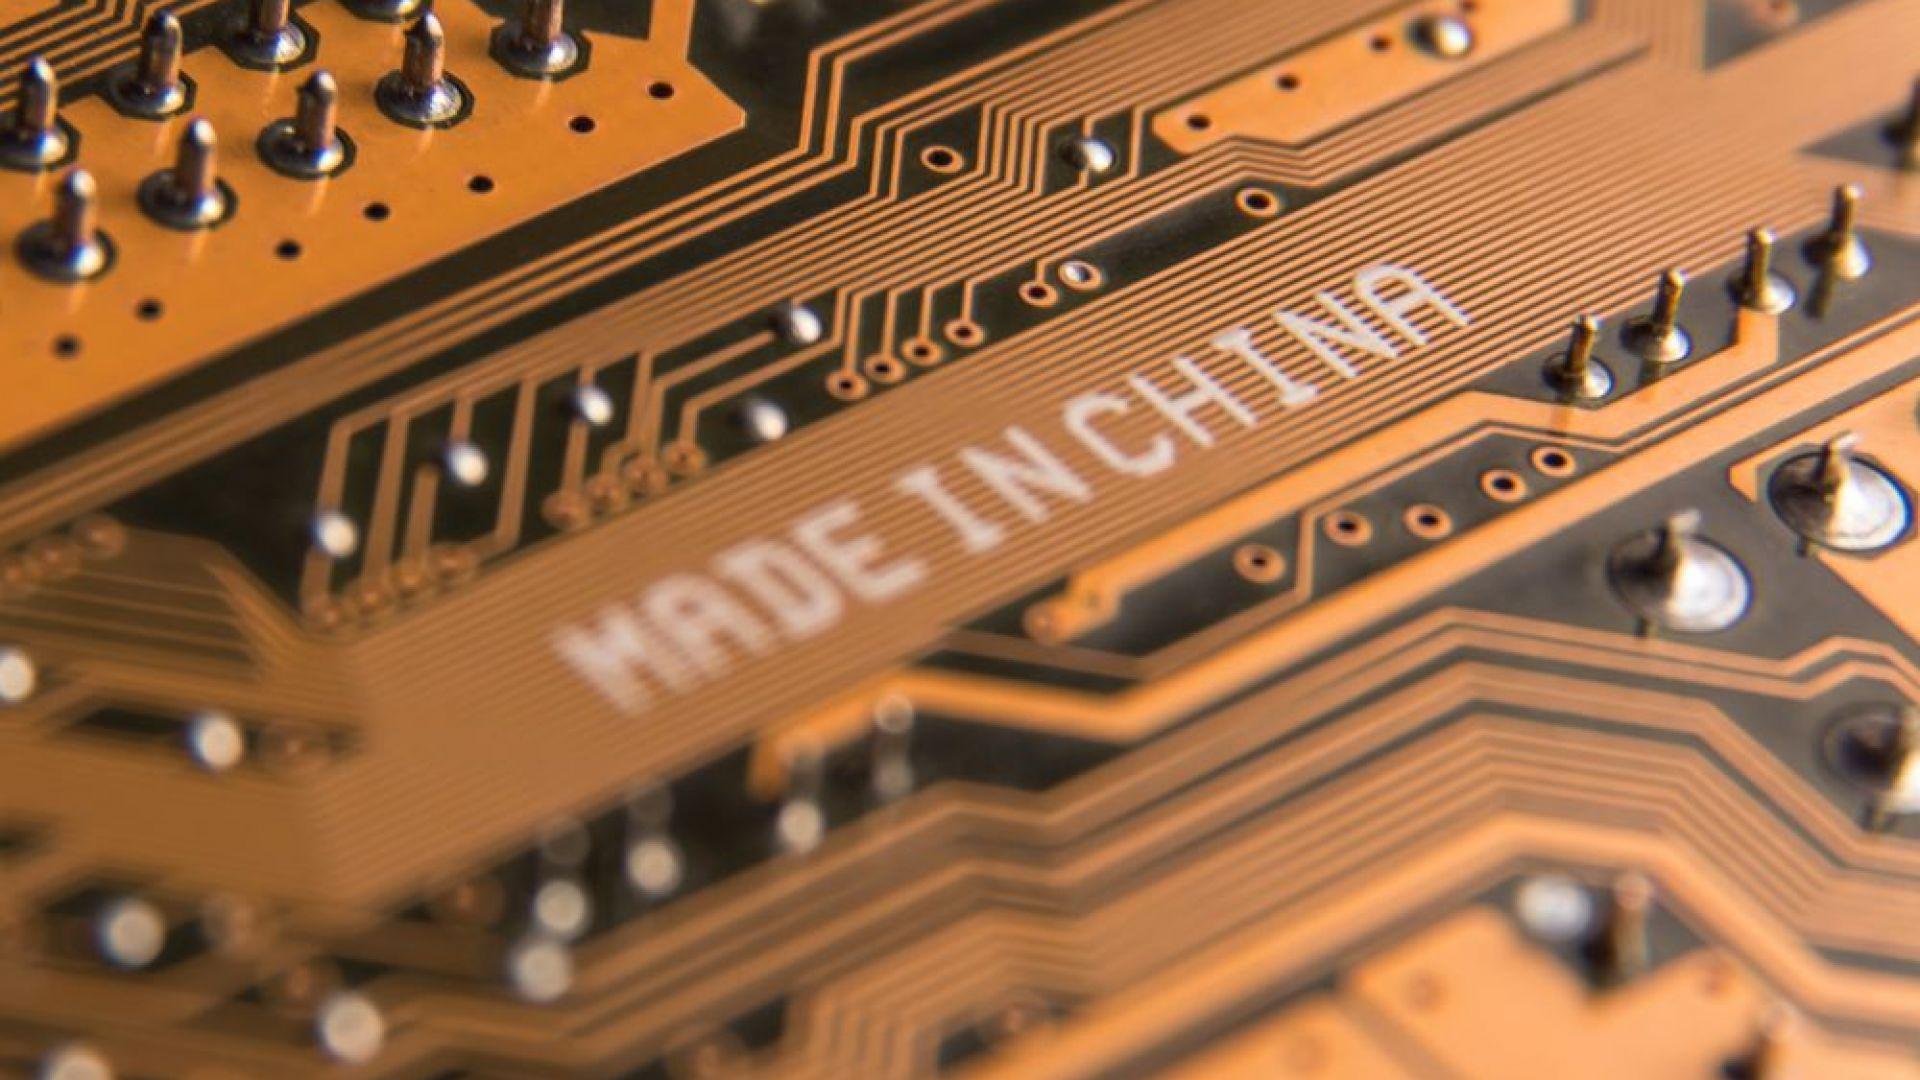 Китай започна производството на х86 процесори